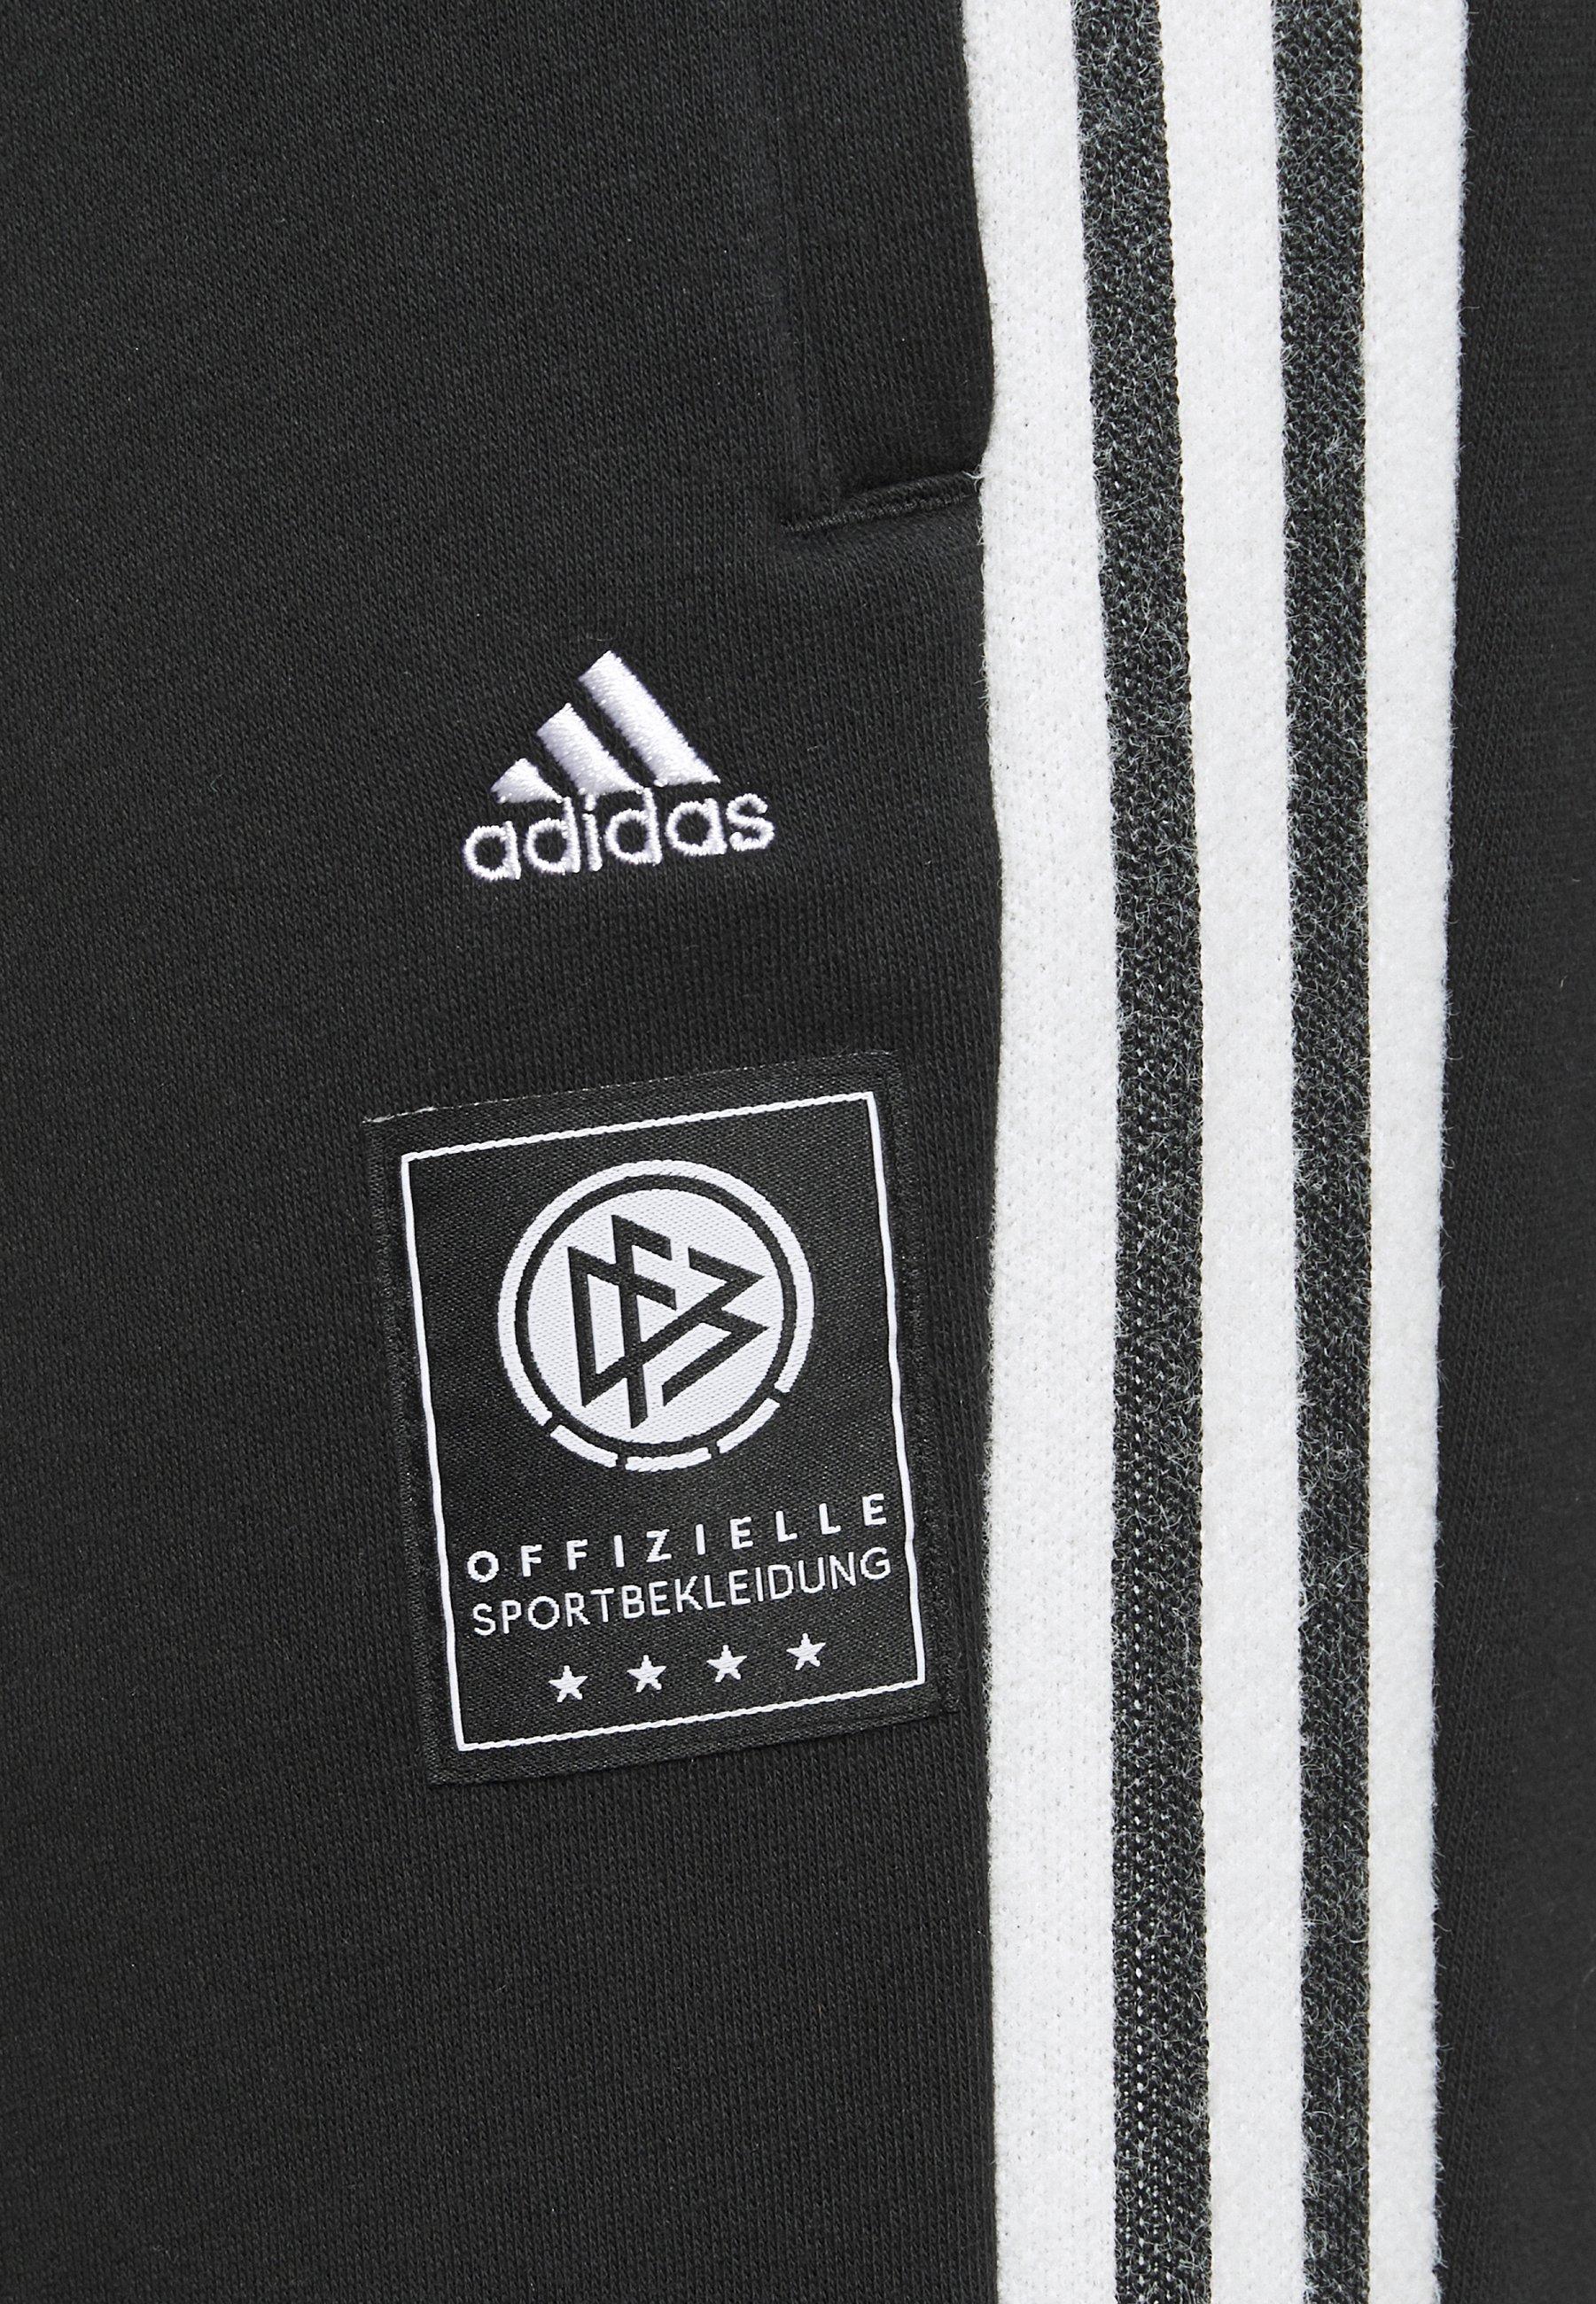 Adidas Performance Deutschland Dfb Icons Pant - Landslagströjor Black